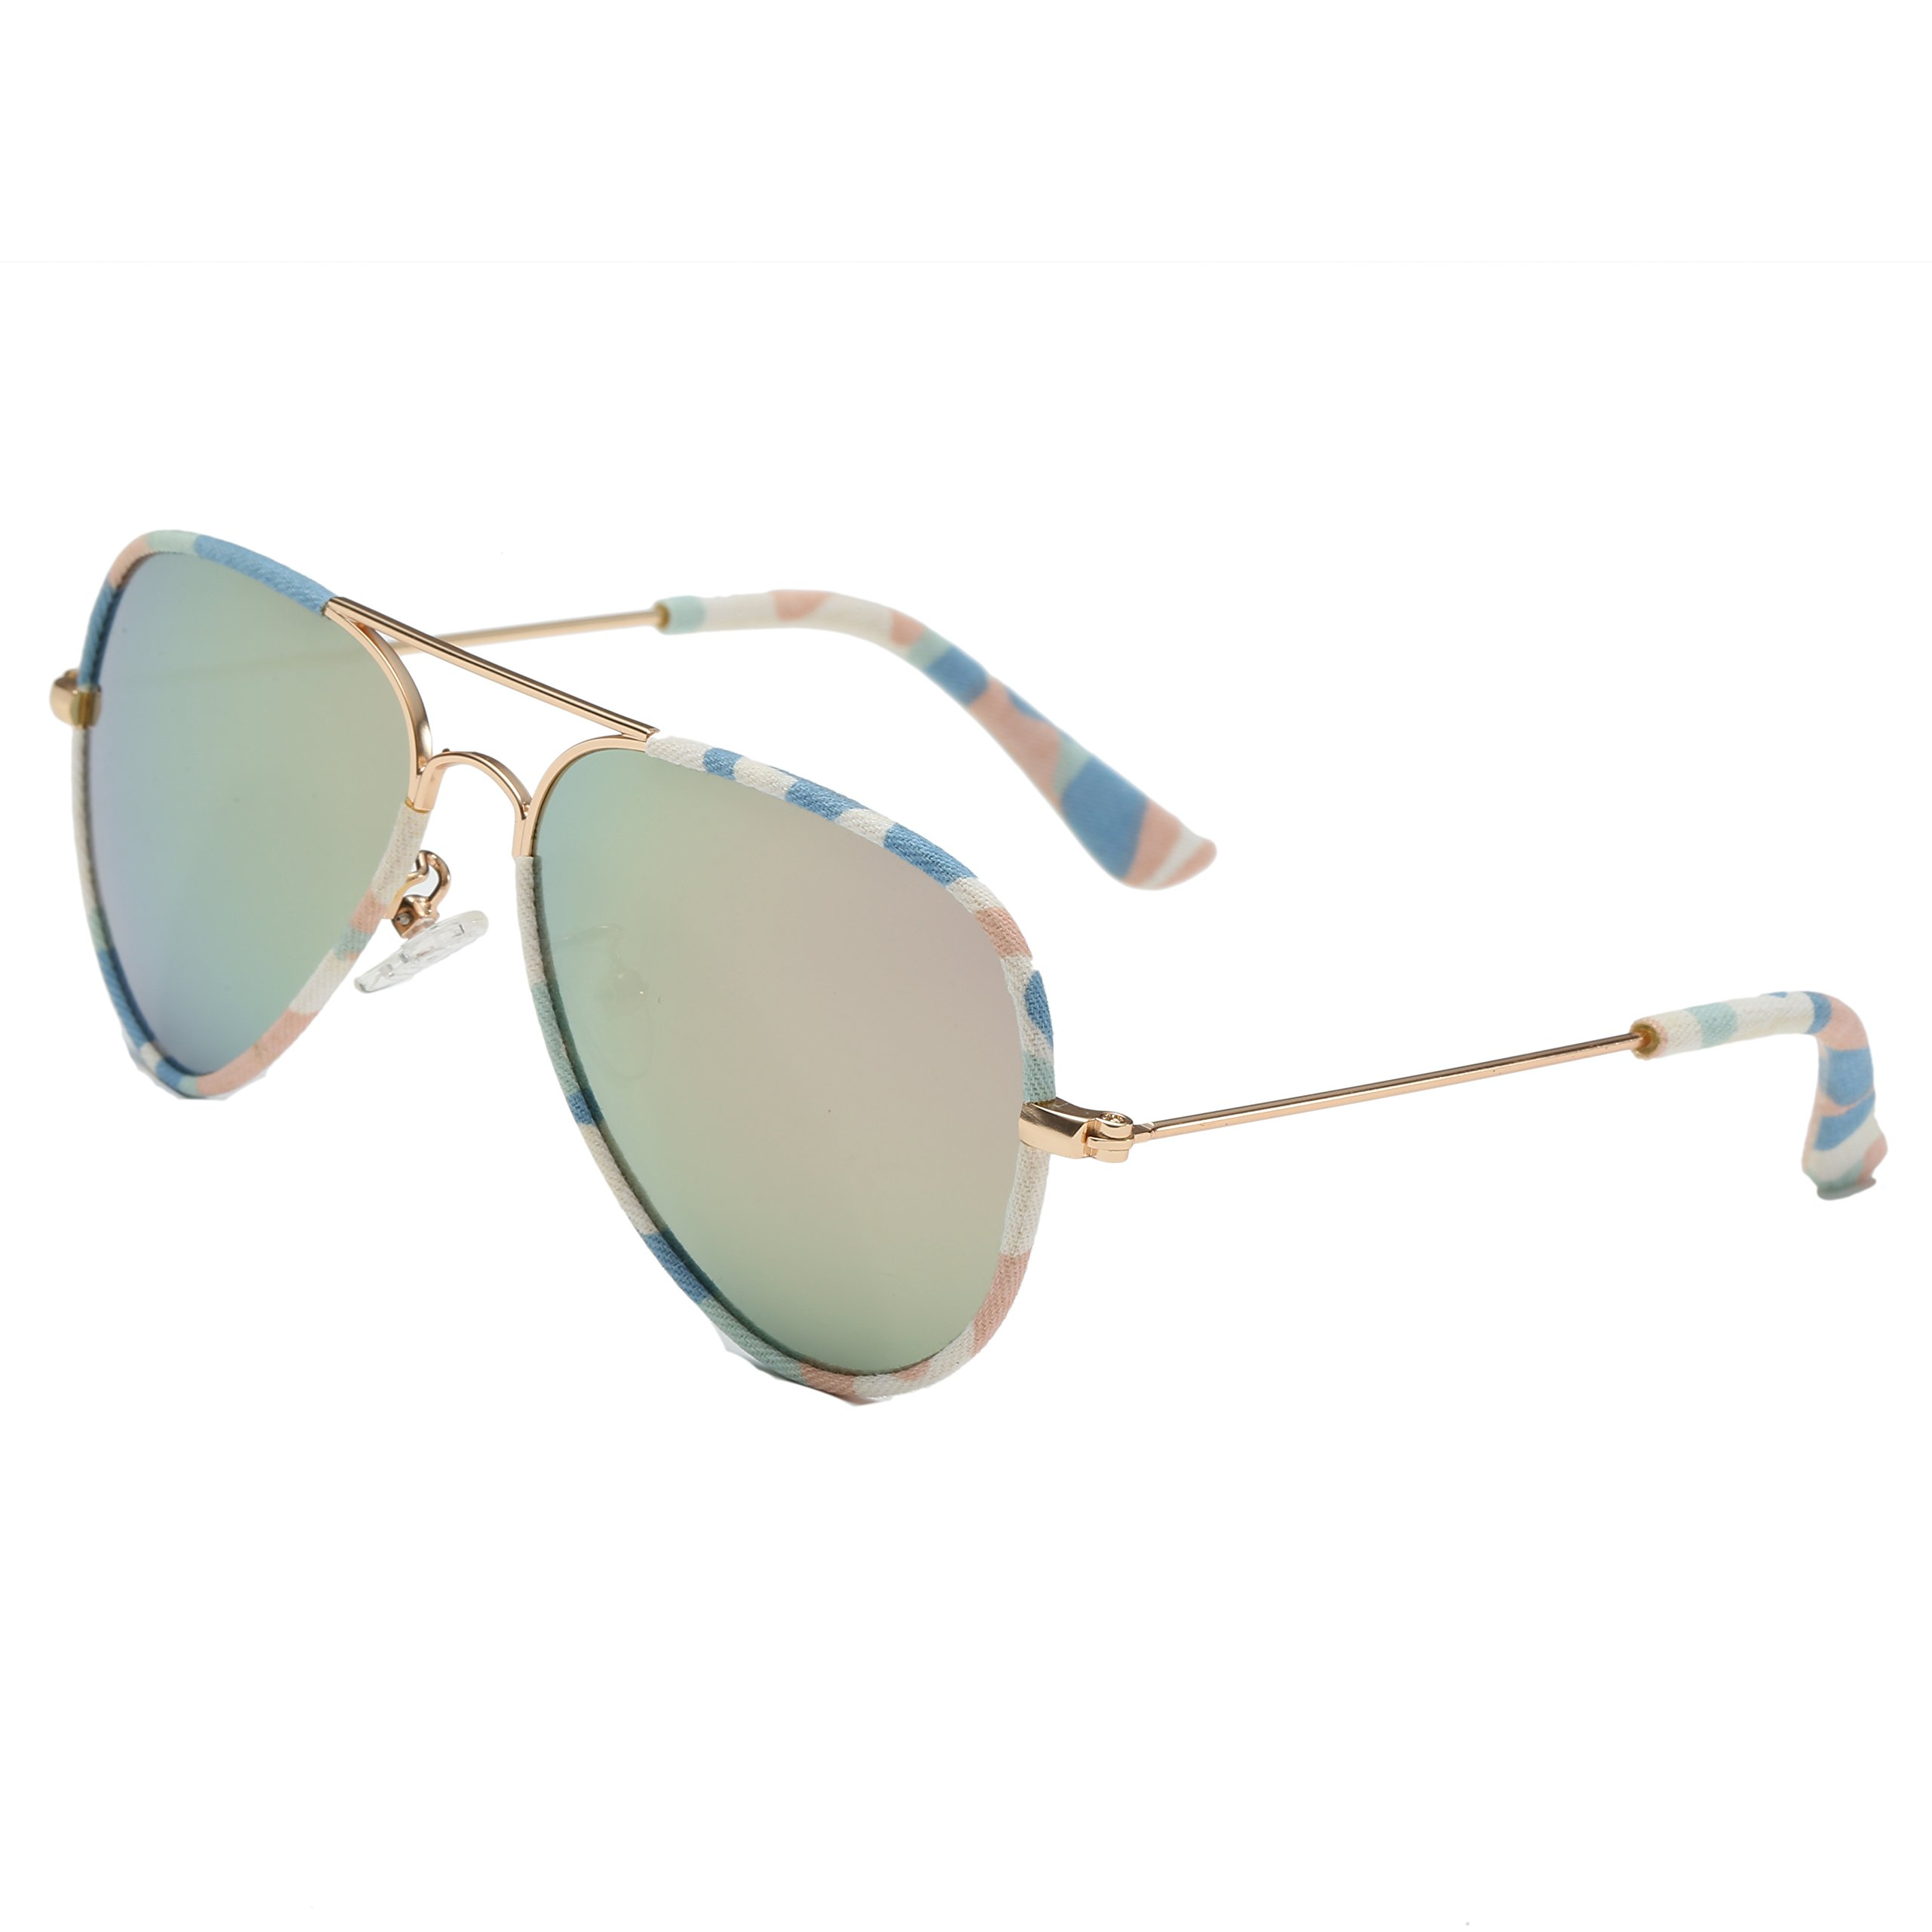 Evebright Kids Girls Aviator Polarized Sunglasses Metal Frame Pink Mirror Lens 2~12yr Old